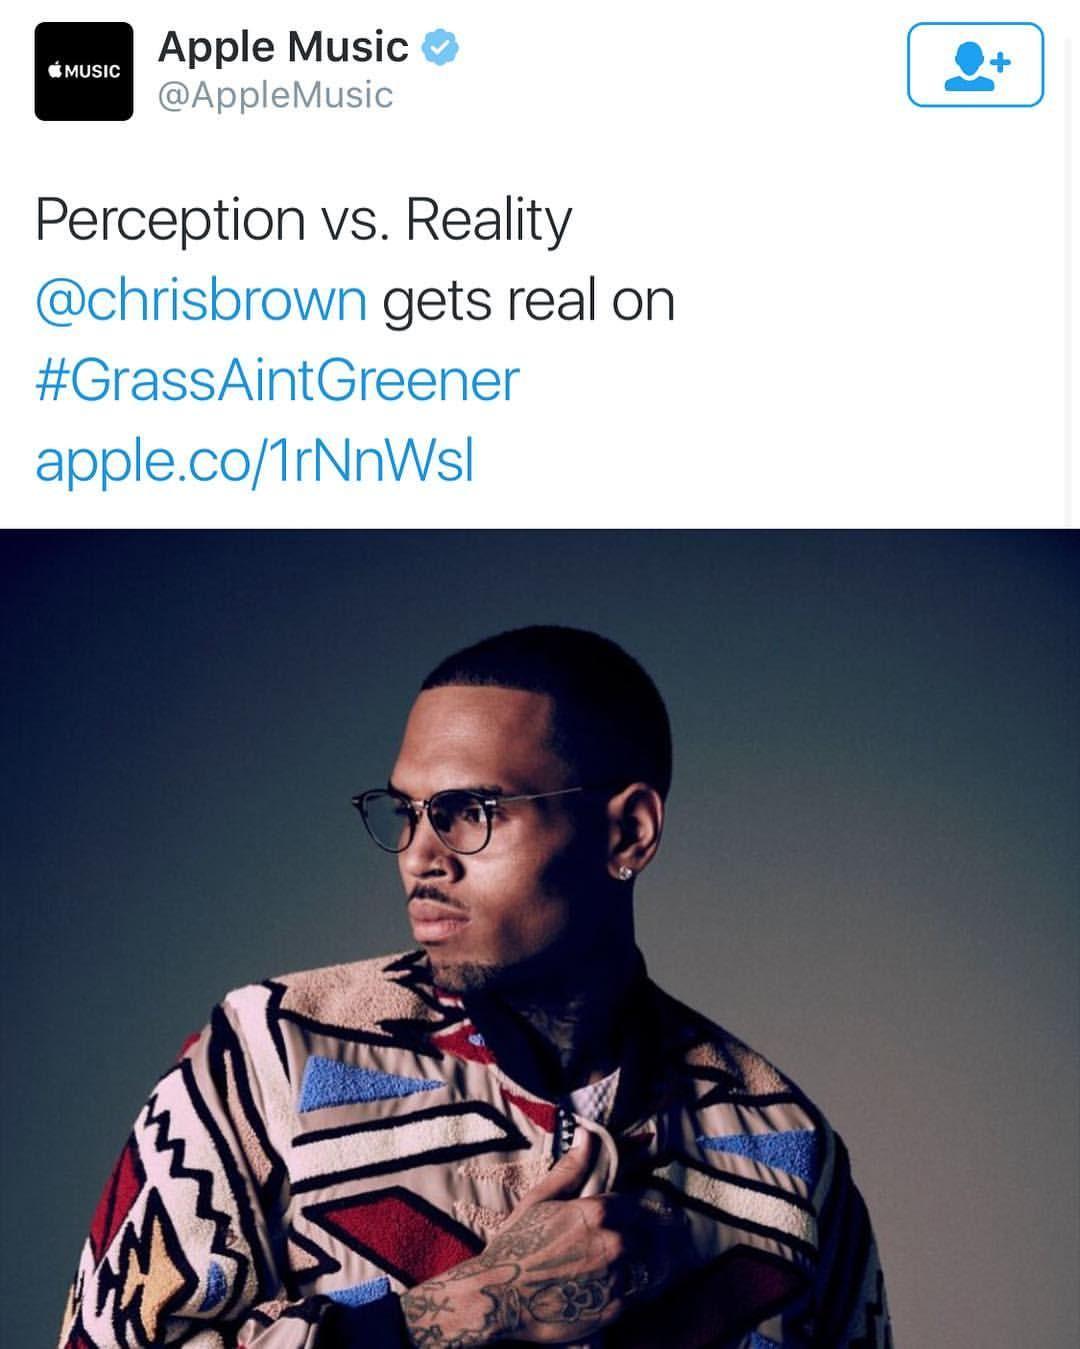 yvetteyou:  Listen to Grass Ain't Greener by Chris Brown on @AppleMusic.https://itun.es/us/lK2ncb?i=1110927678  STREAM and BUY #grassaintgreener @chrisbrownofficial #ChrisBrown